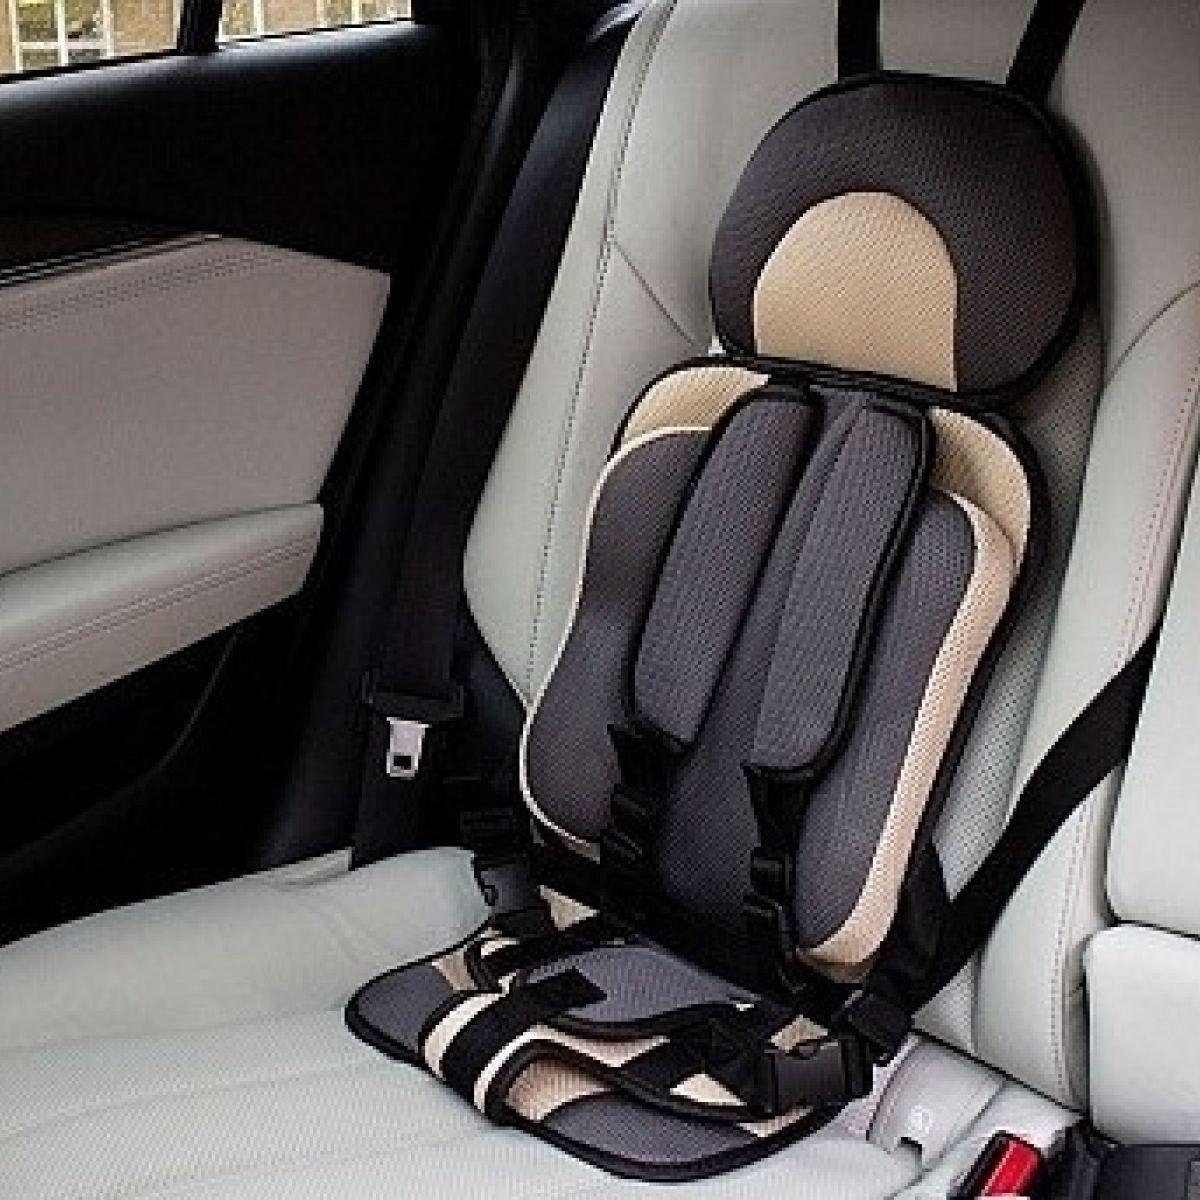 Illegal child car seats on sale via